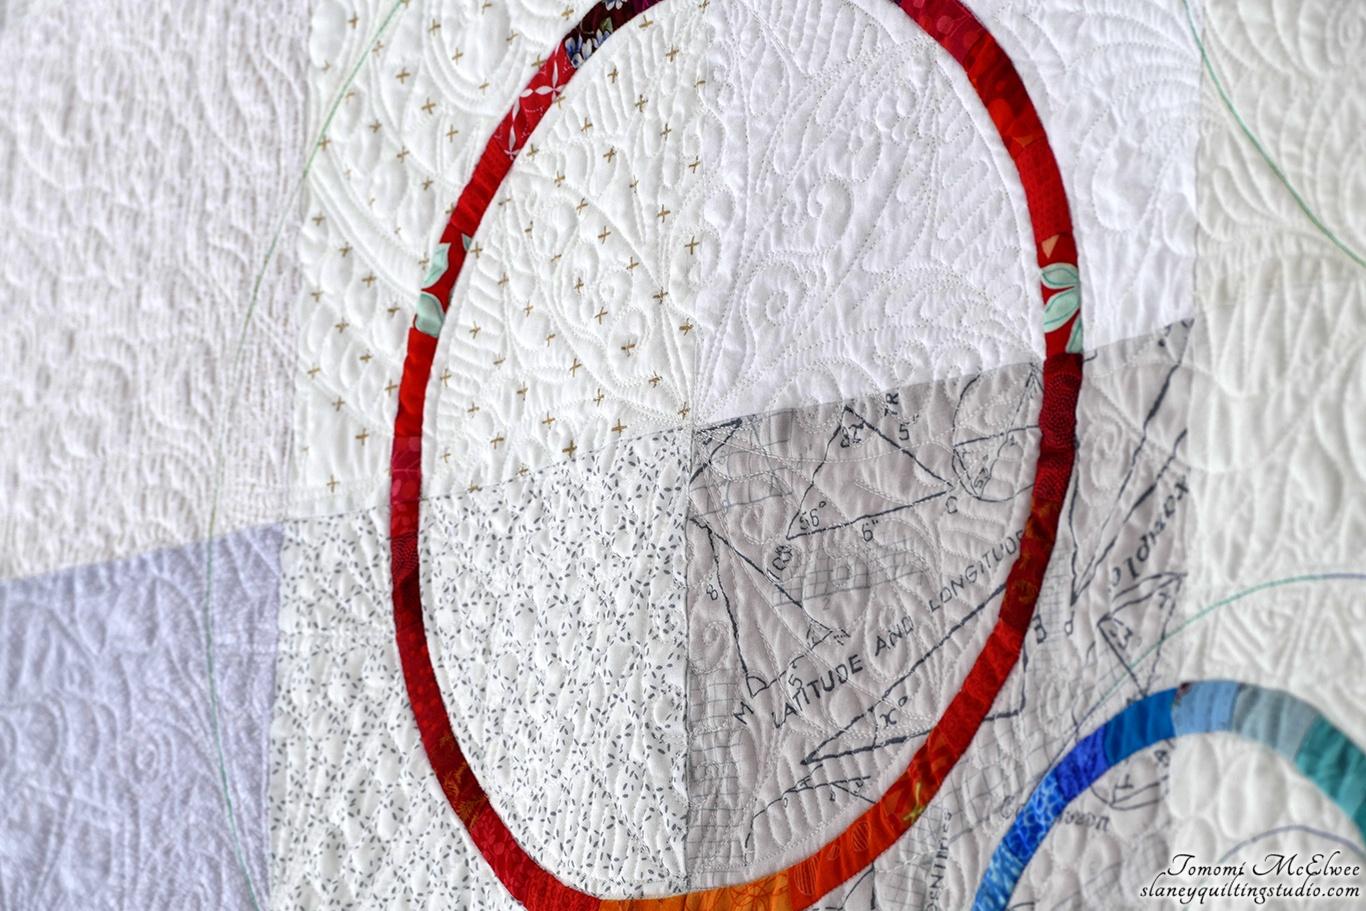 https://slaneyquiltingstudio.com/wp-content/uploads/2019/01/rings-02.jpg